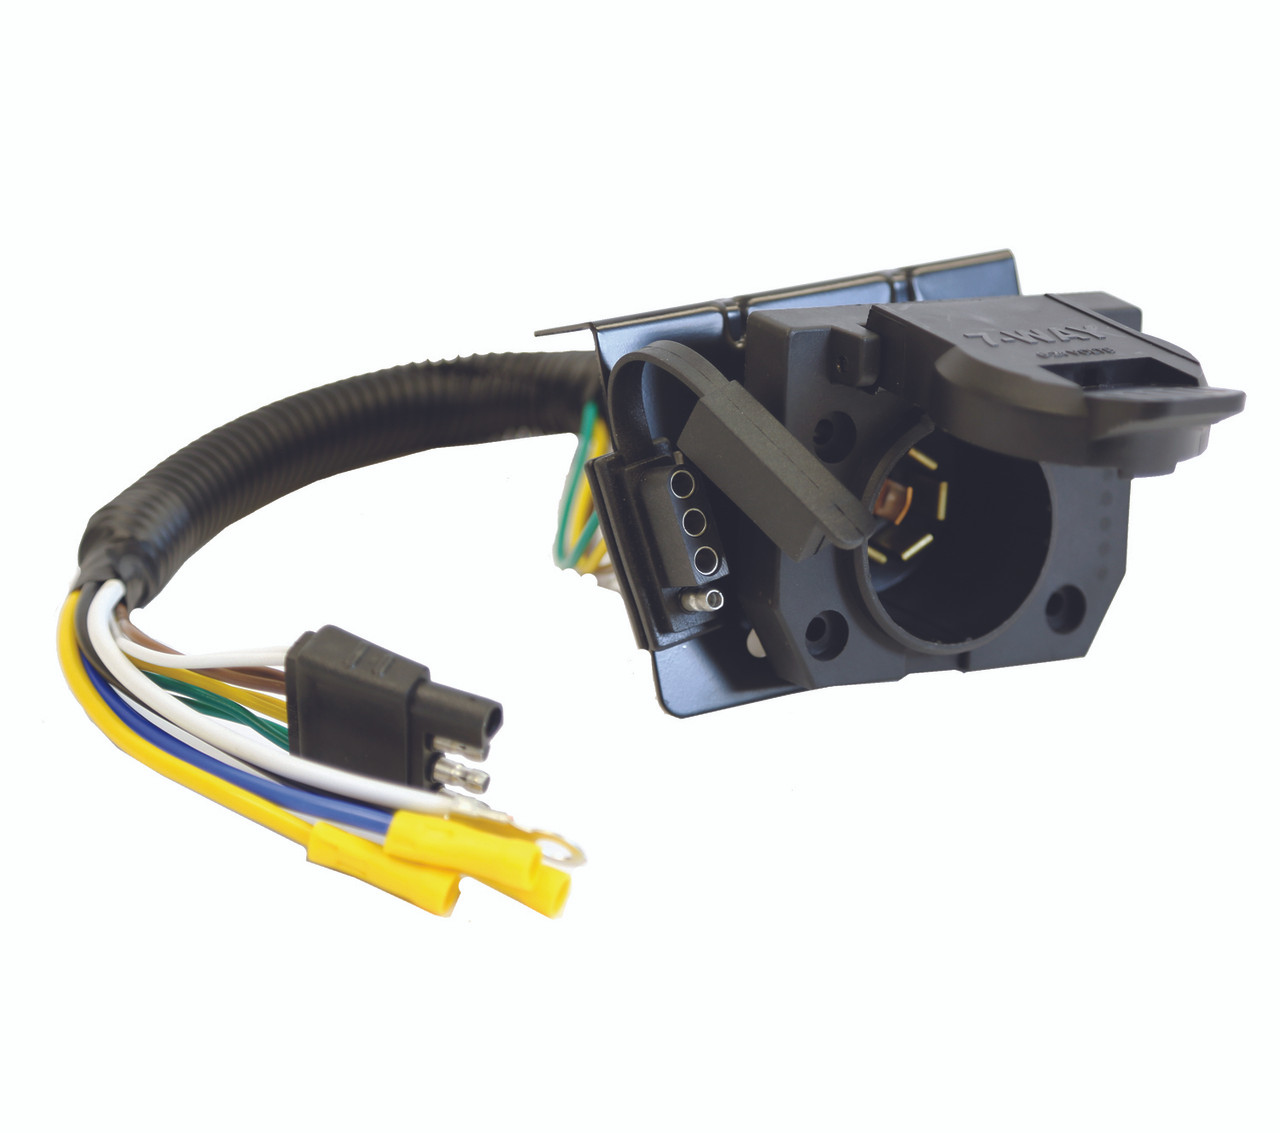 small resolution of 37185 4 prong flat to 4 prong flat and 7 way flat pin adapter croft trailer supply